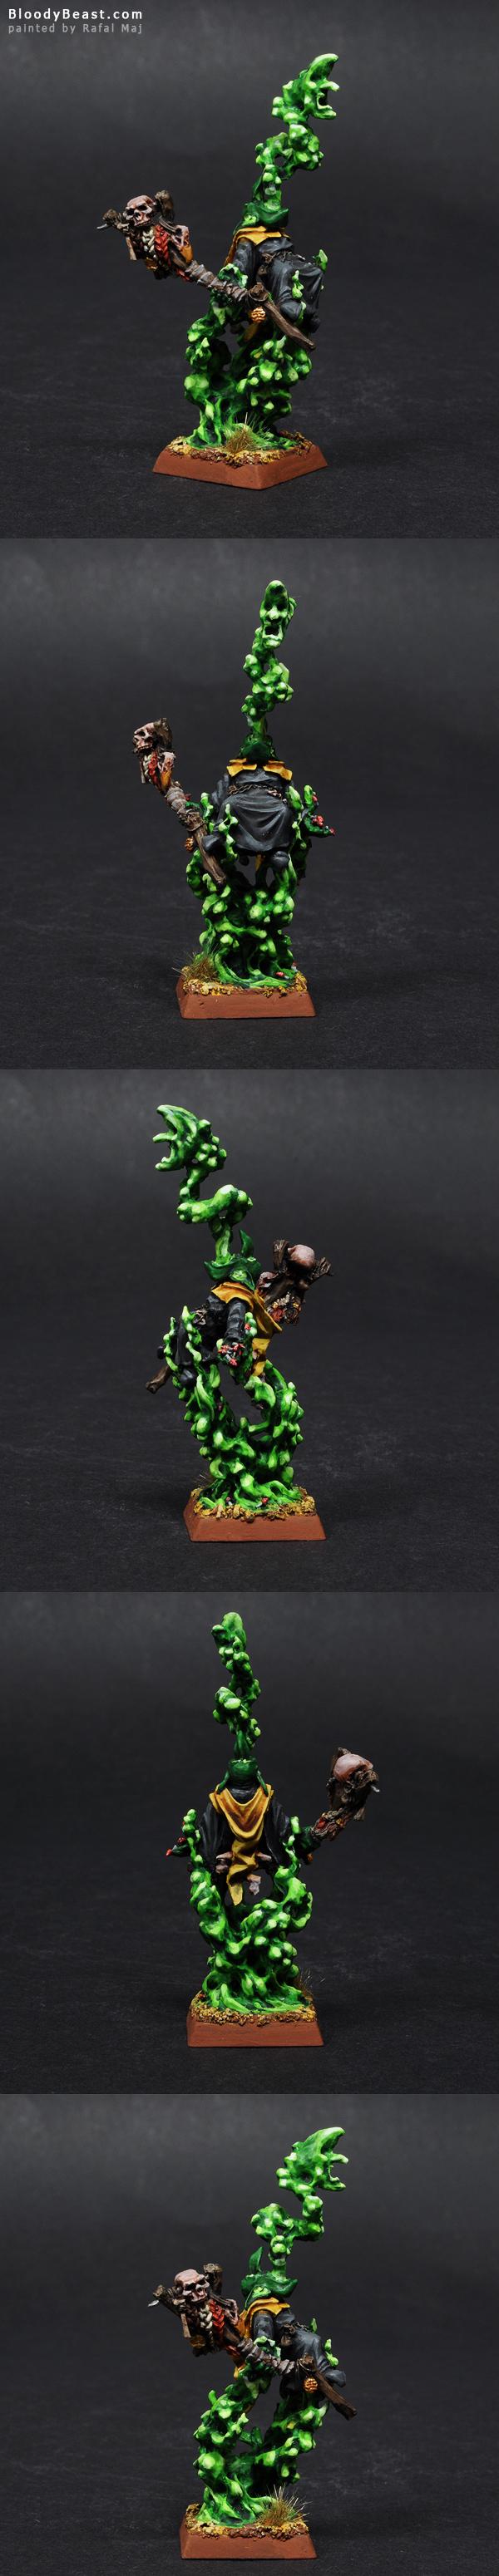 Night Goblin Shaman painted by Rafal Maj (BloodyBeast.com)